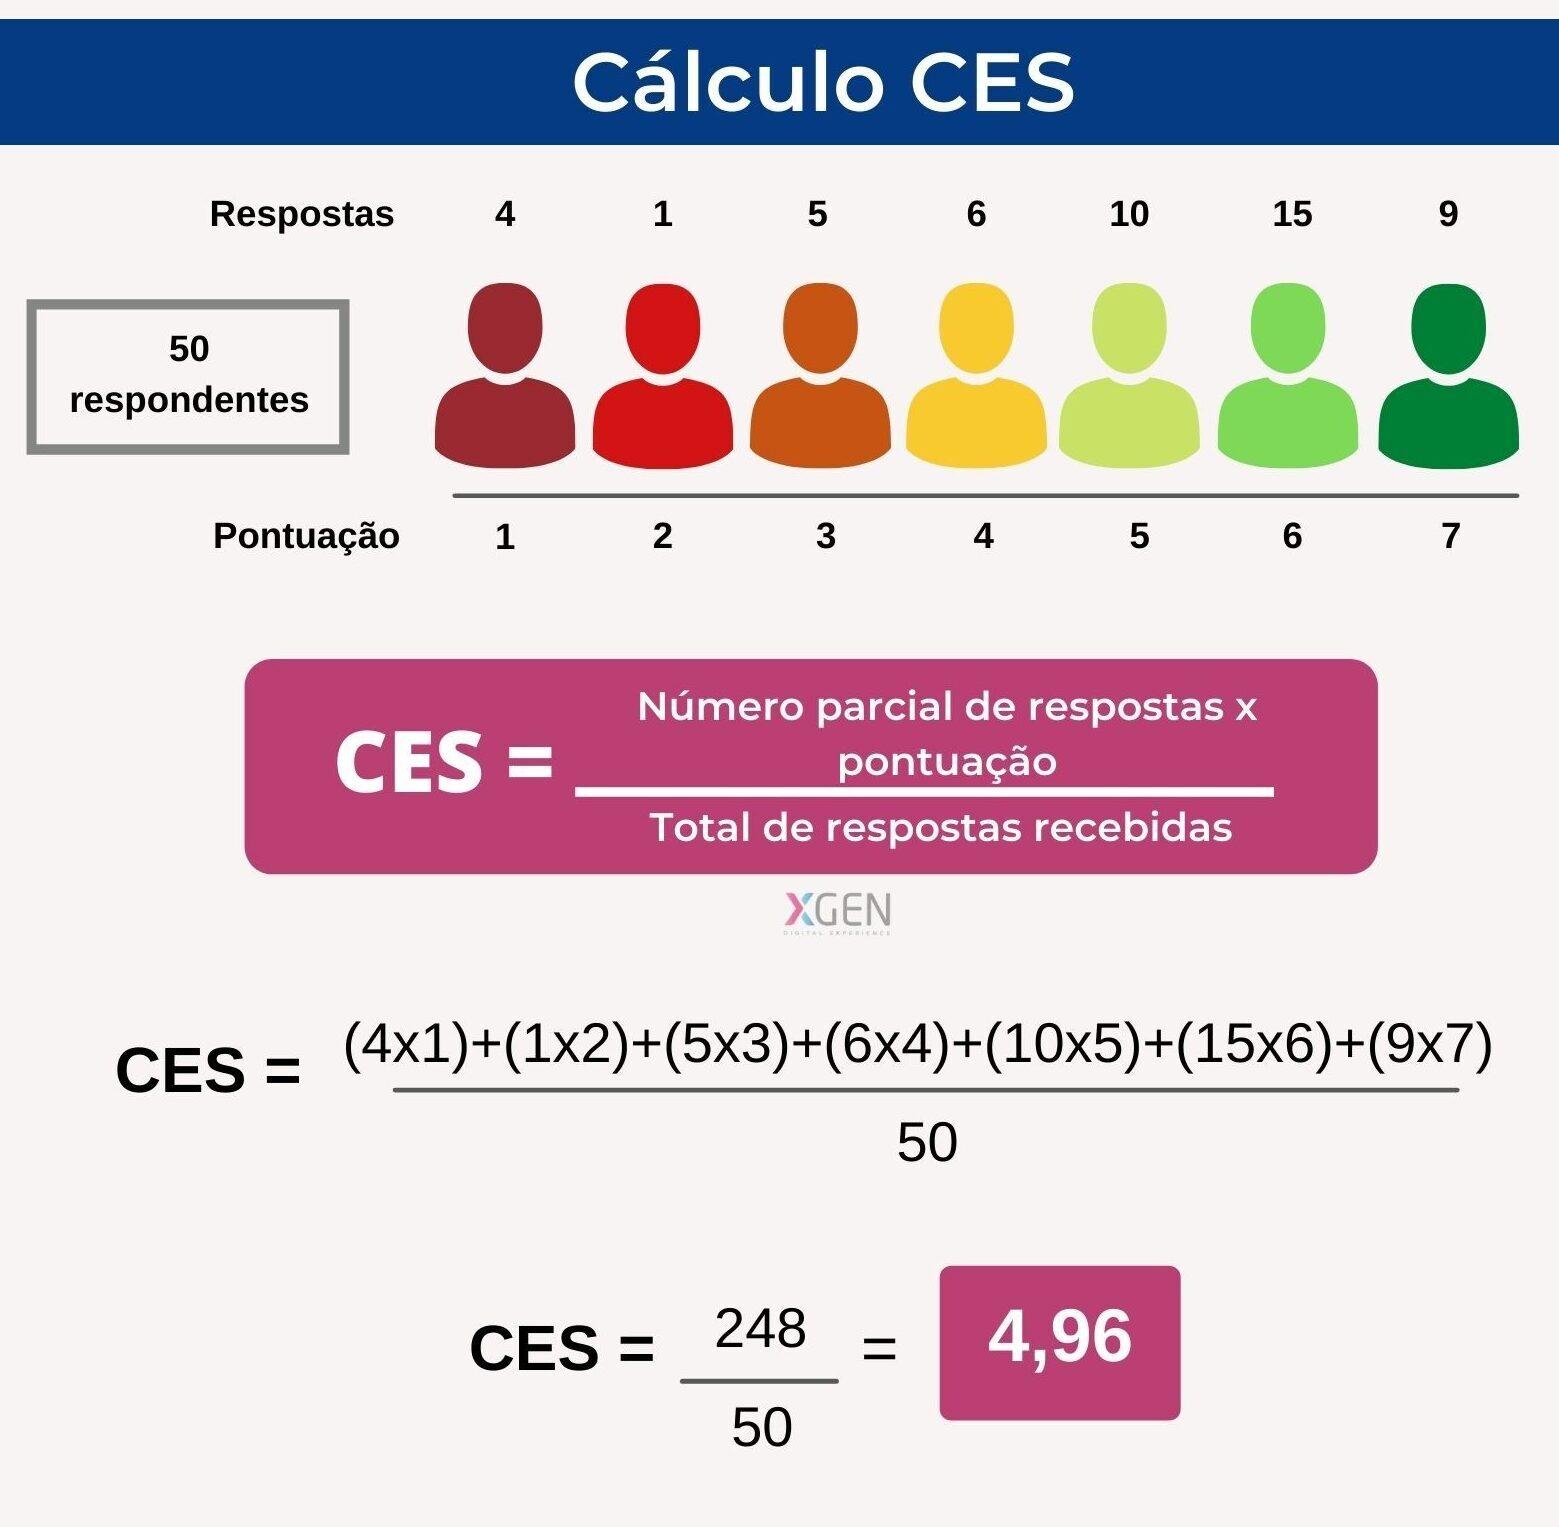 CES - Customer Effort Score - Como calcular